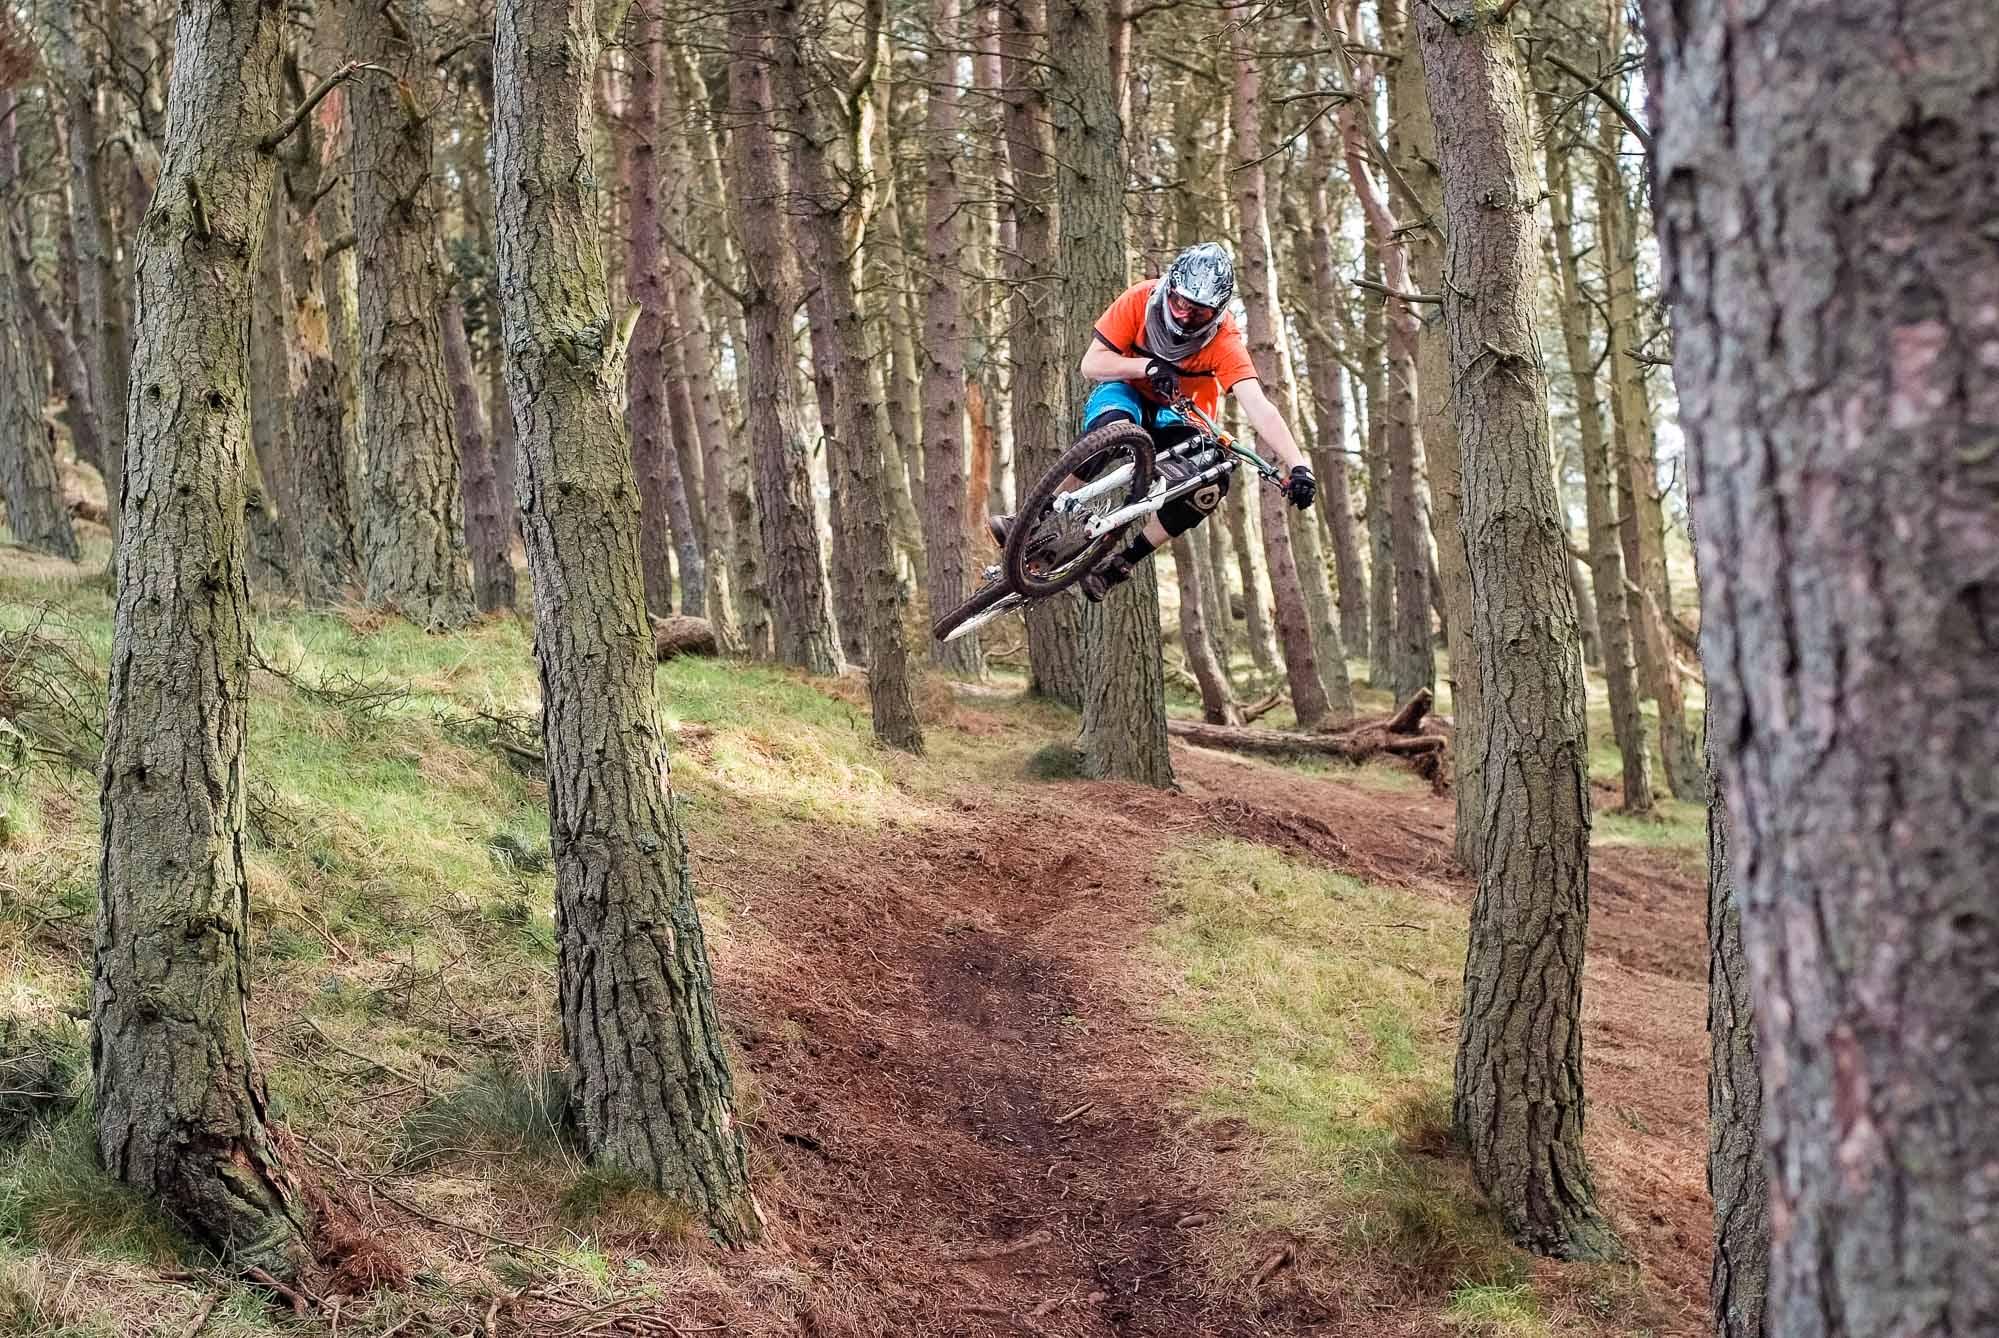 Mountain biker Keith Scott jumping his prototype Banshee Legend at Bonaly Trails, Edinburgh.